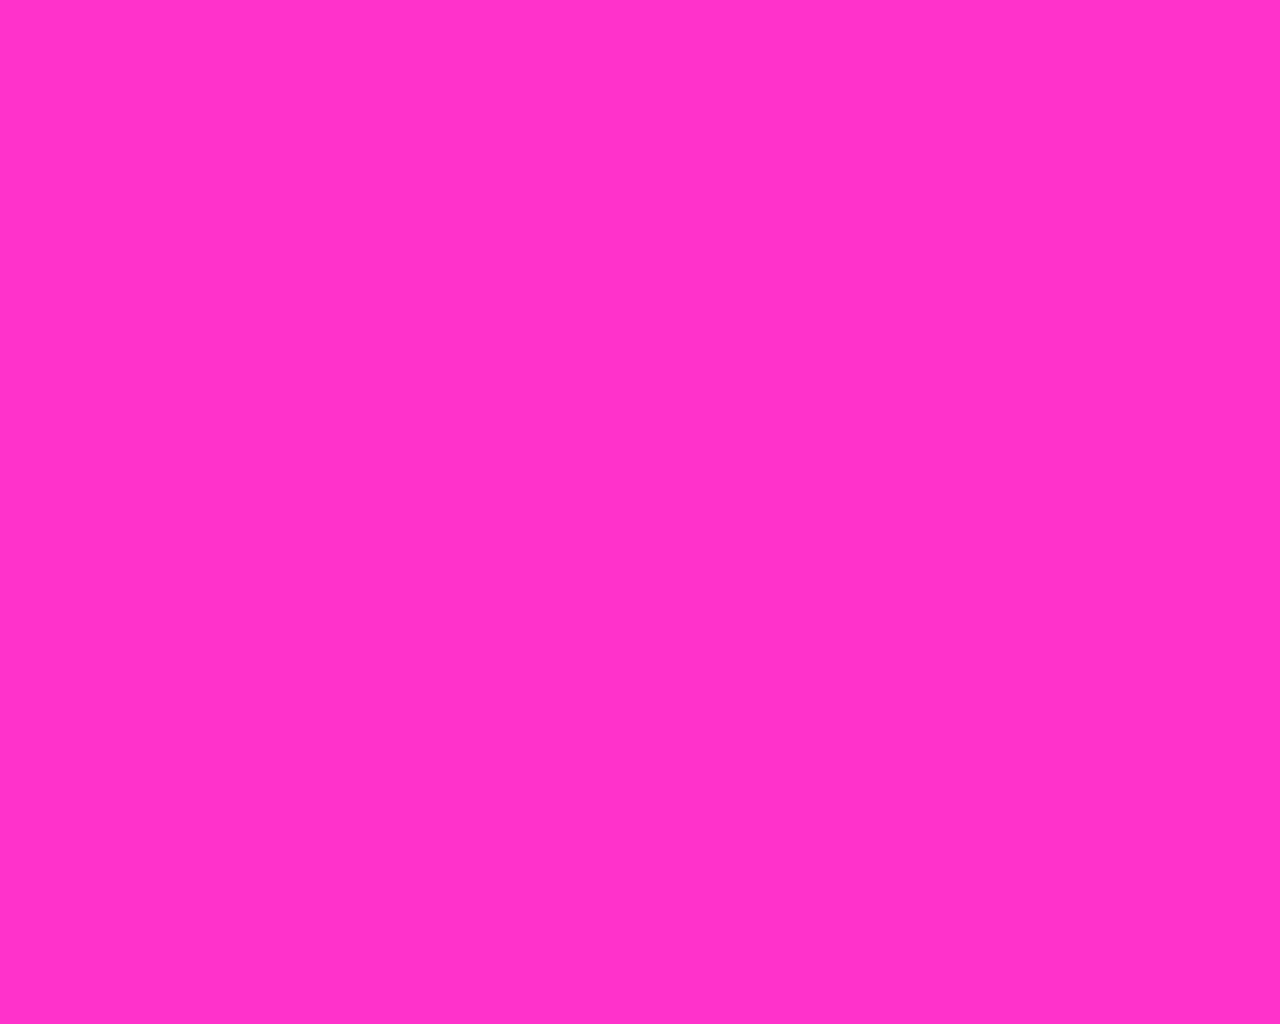 1280x1024 Razzle Dazzle Rose Solid Color Background